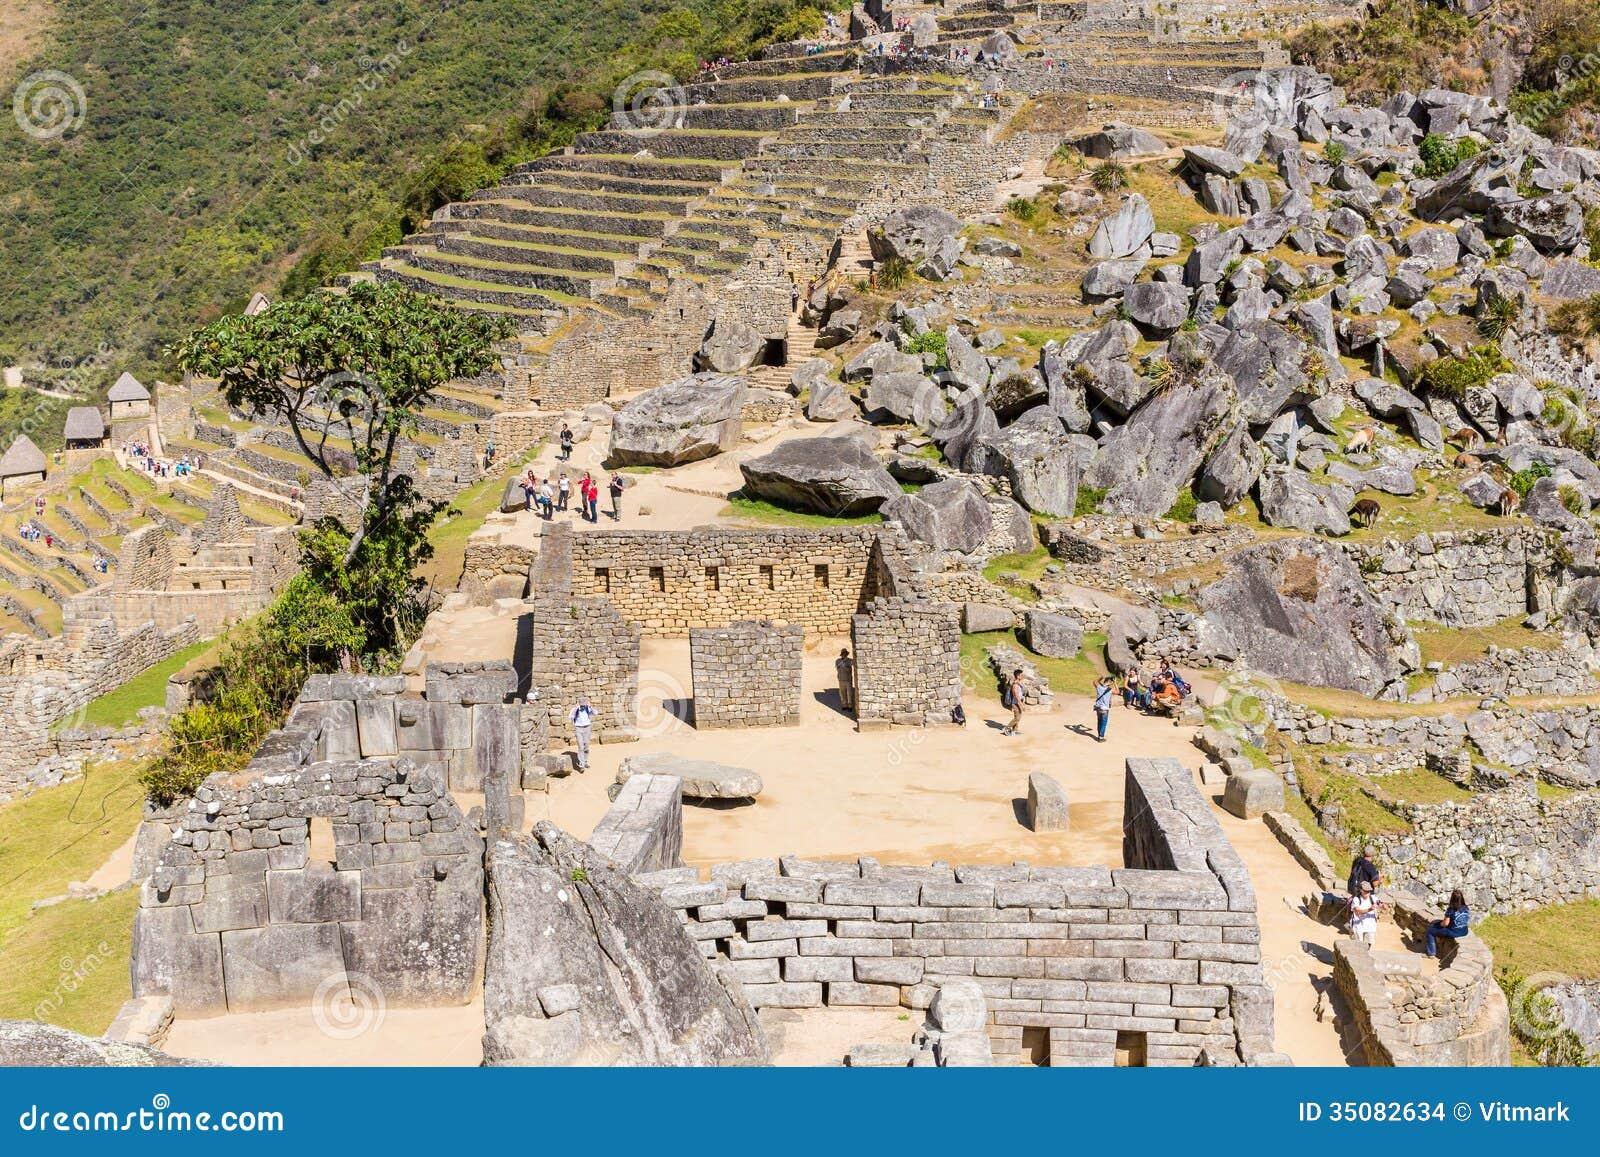 Geheimzinnige stad machu picchu peru zuid amerika. het de ruïnes